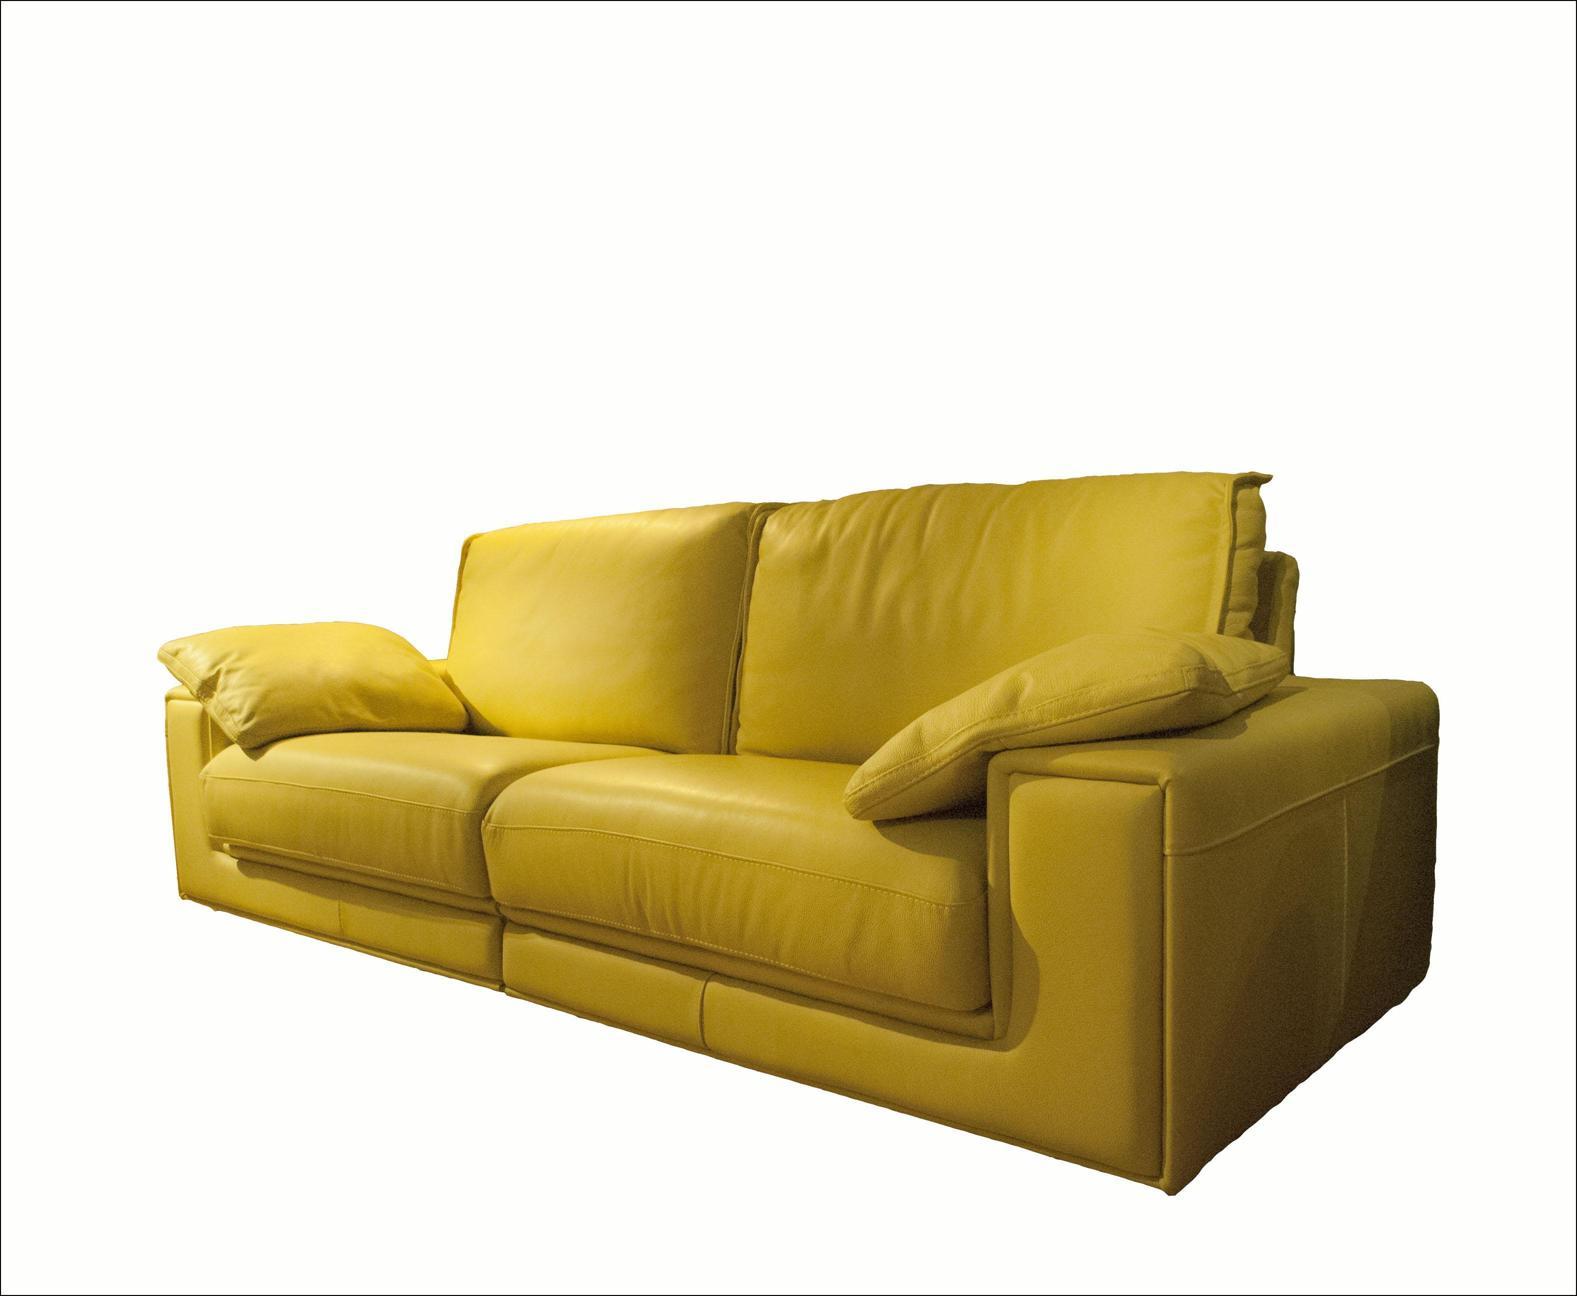 Sof de piel pistacho for Ofertas de sofas en piel